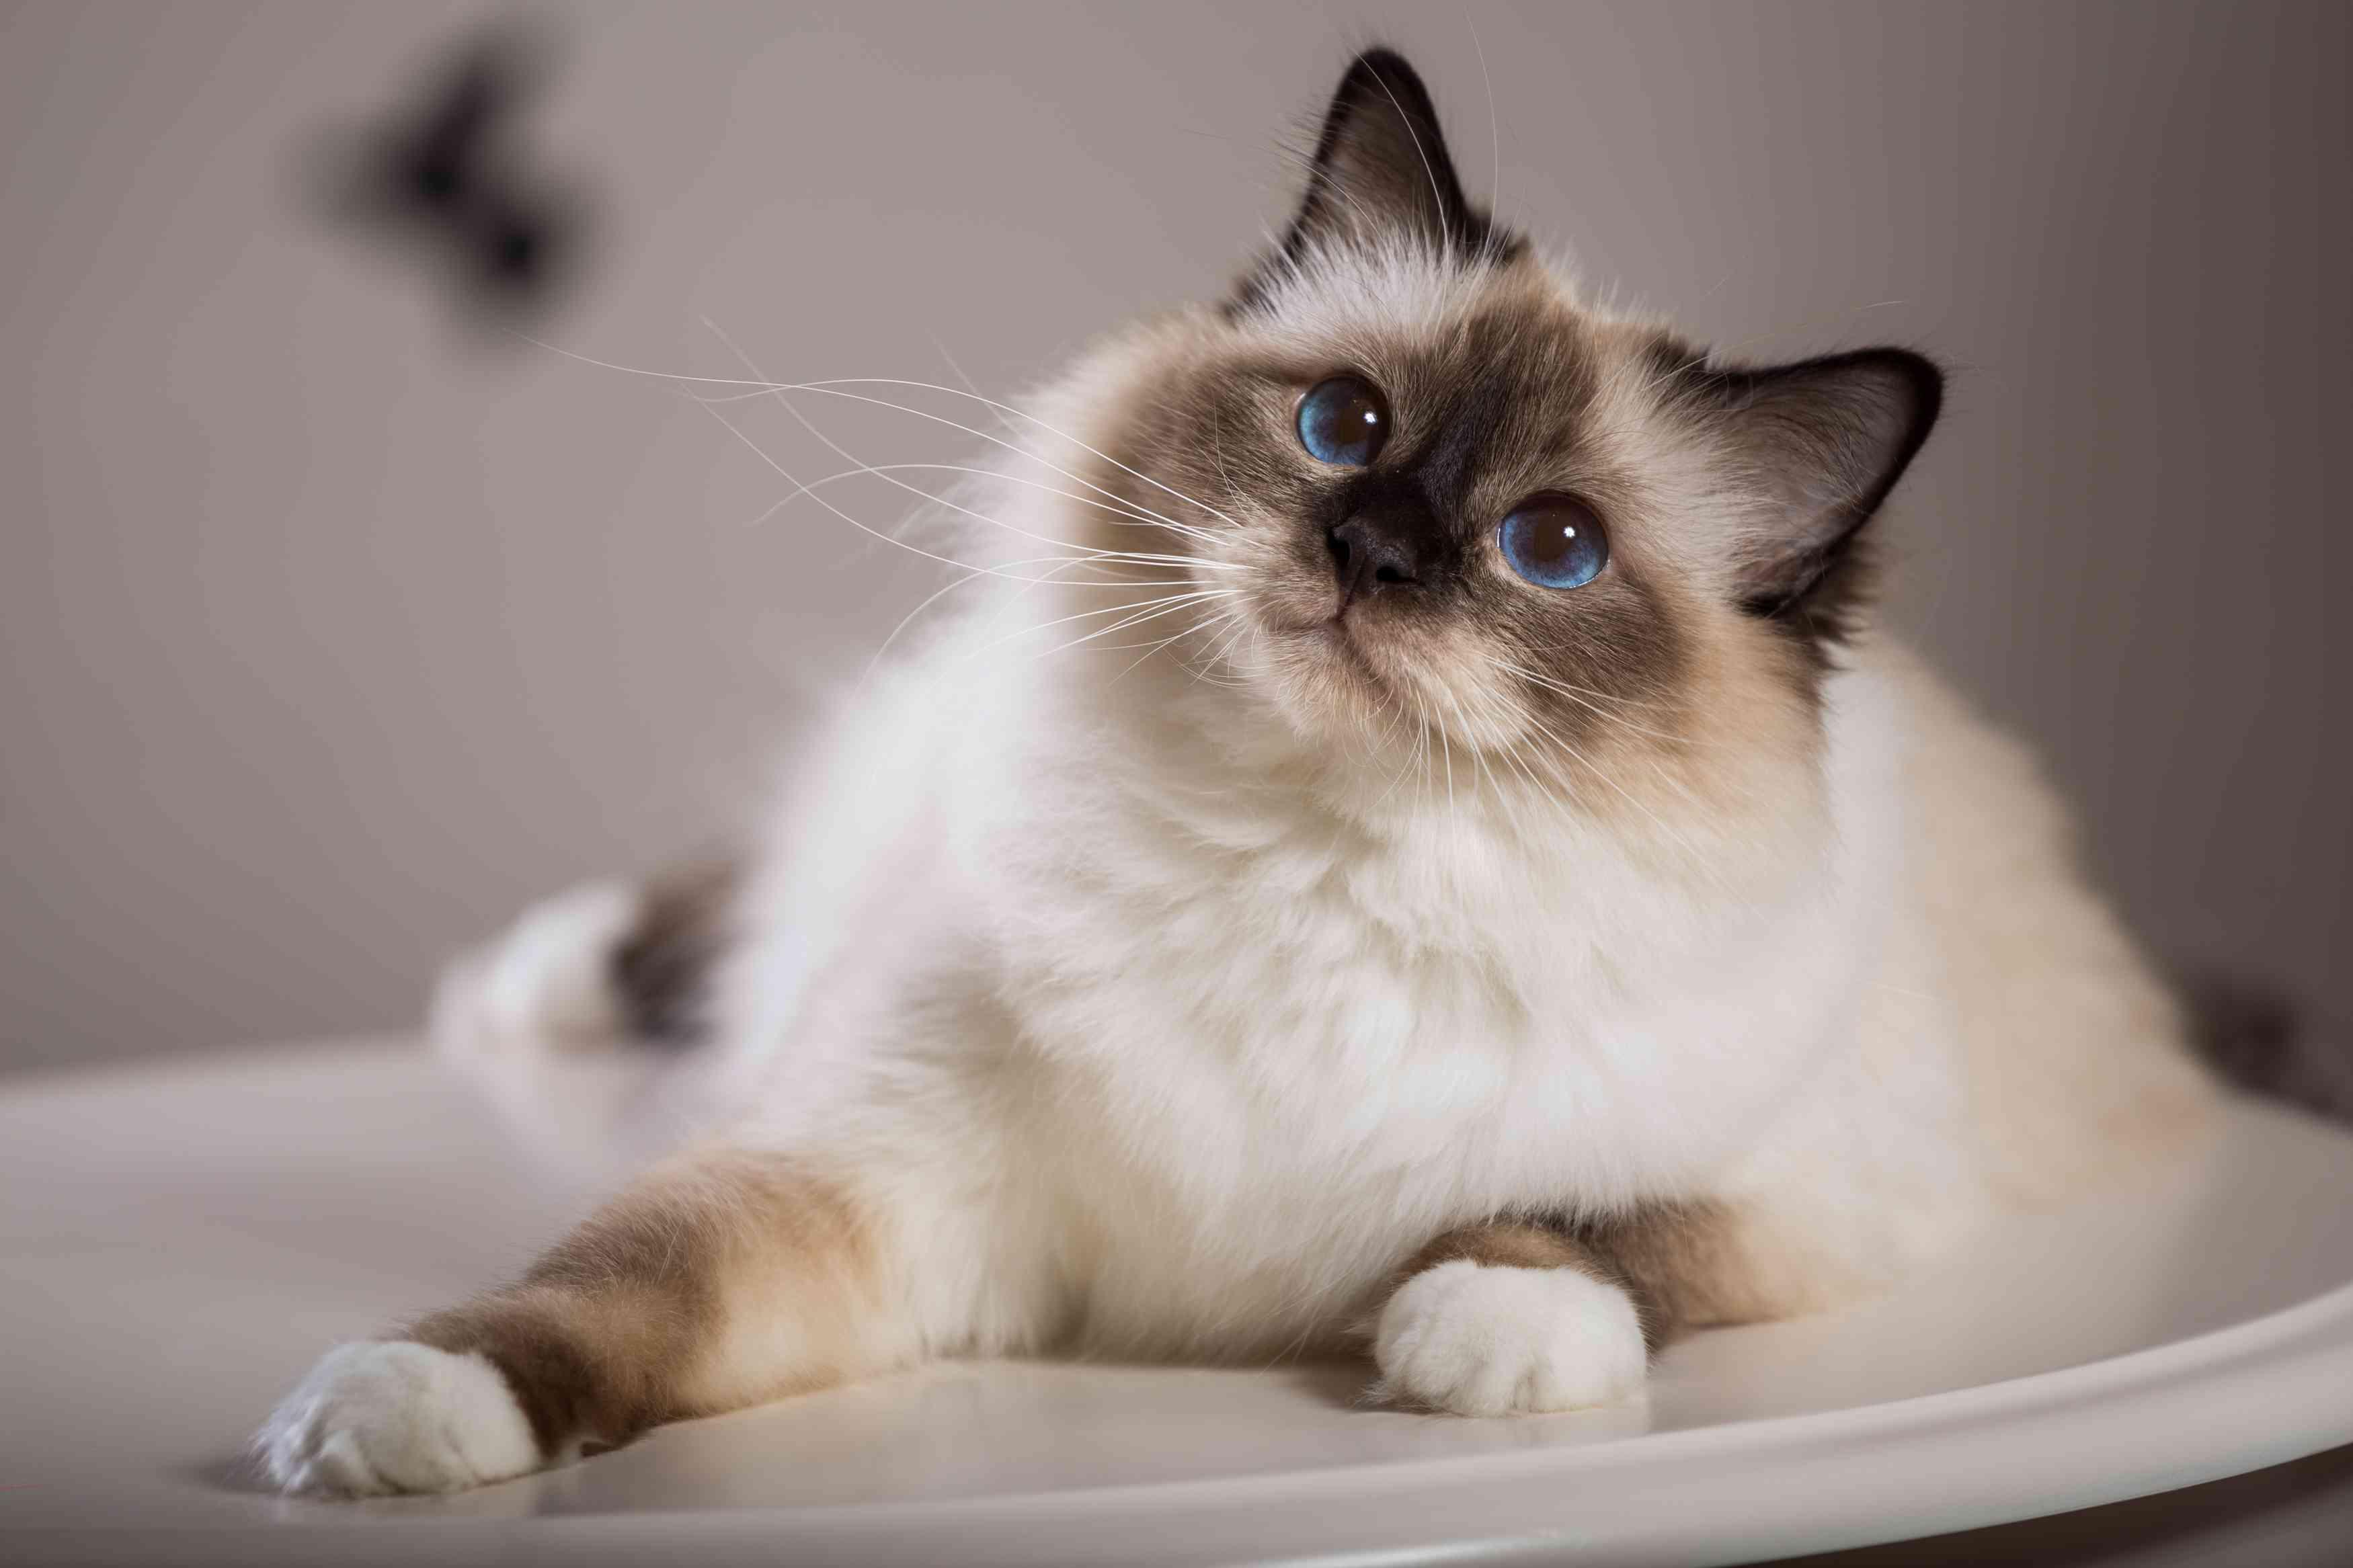 Blue-eyed Birman cat sitting on a round, white table